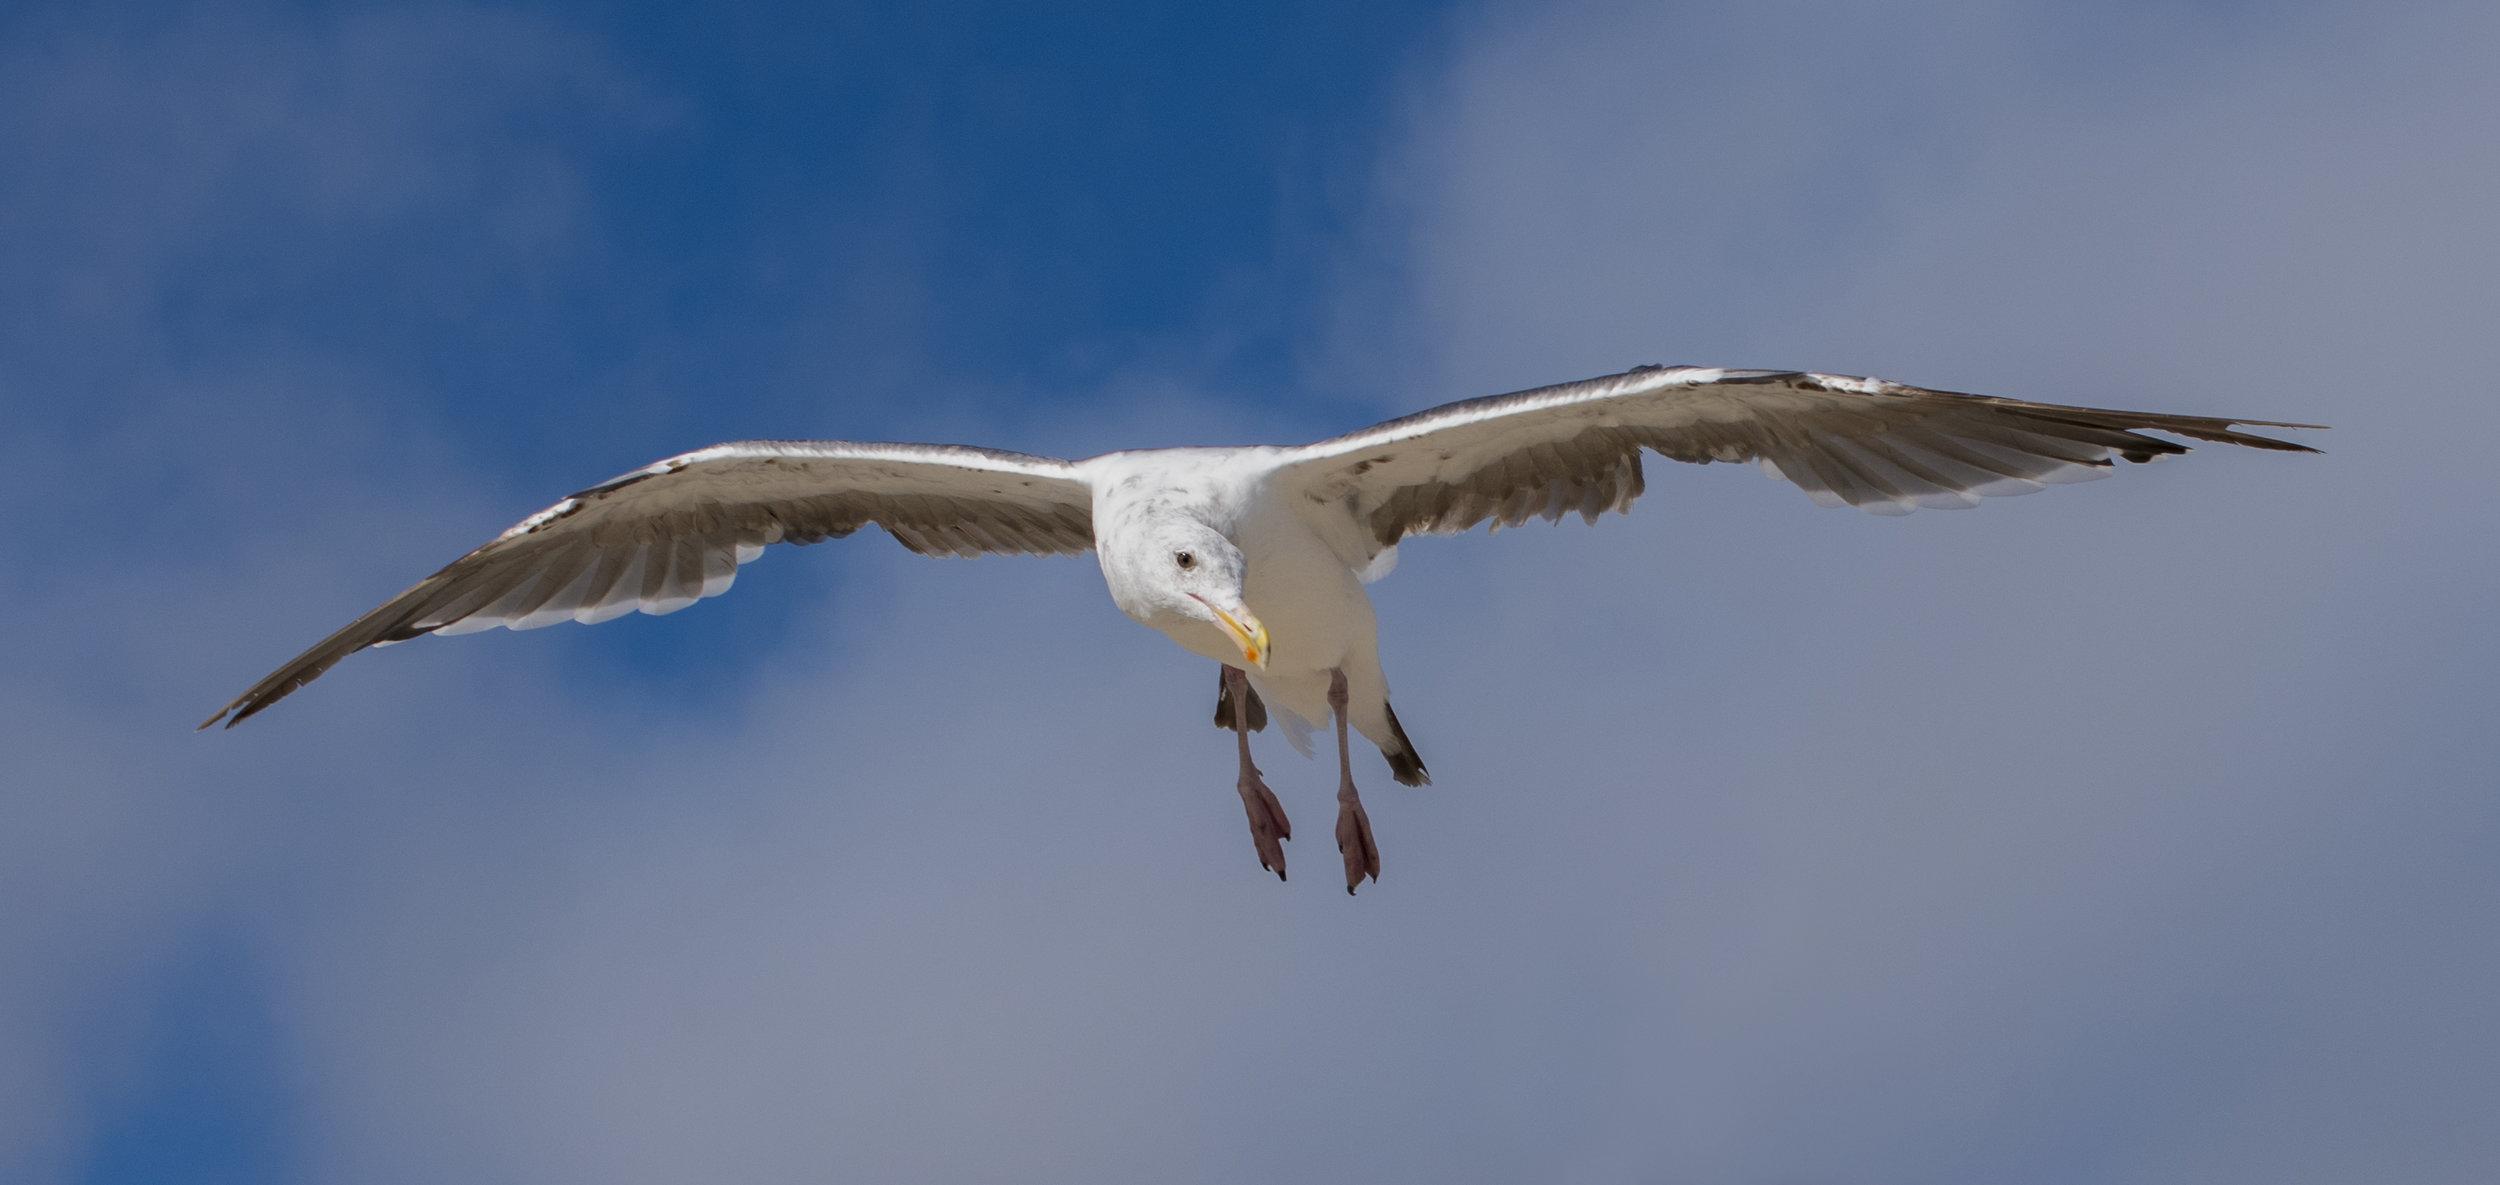 Western Gull at Venice Beach, Los Angeles, California